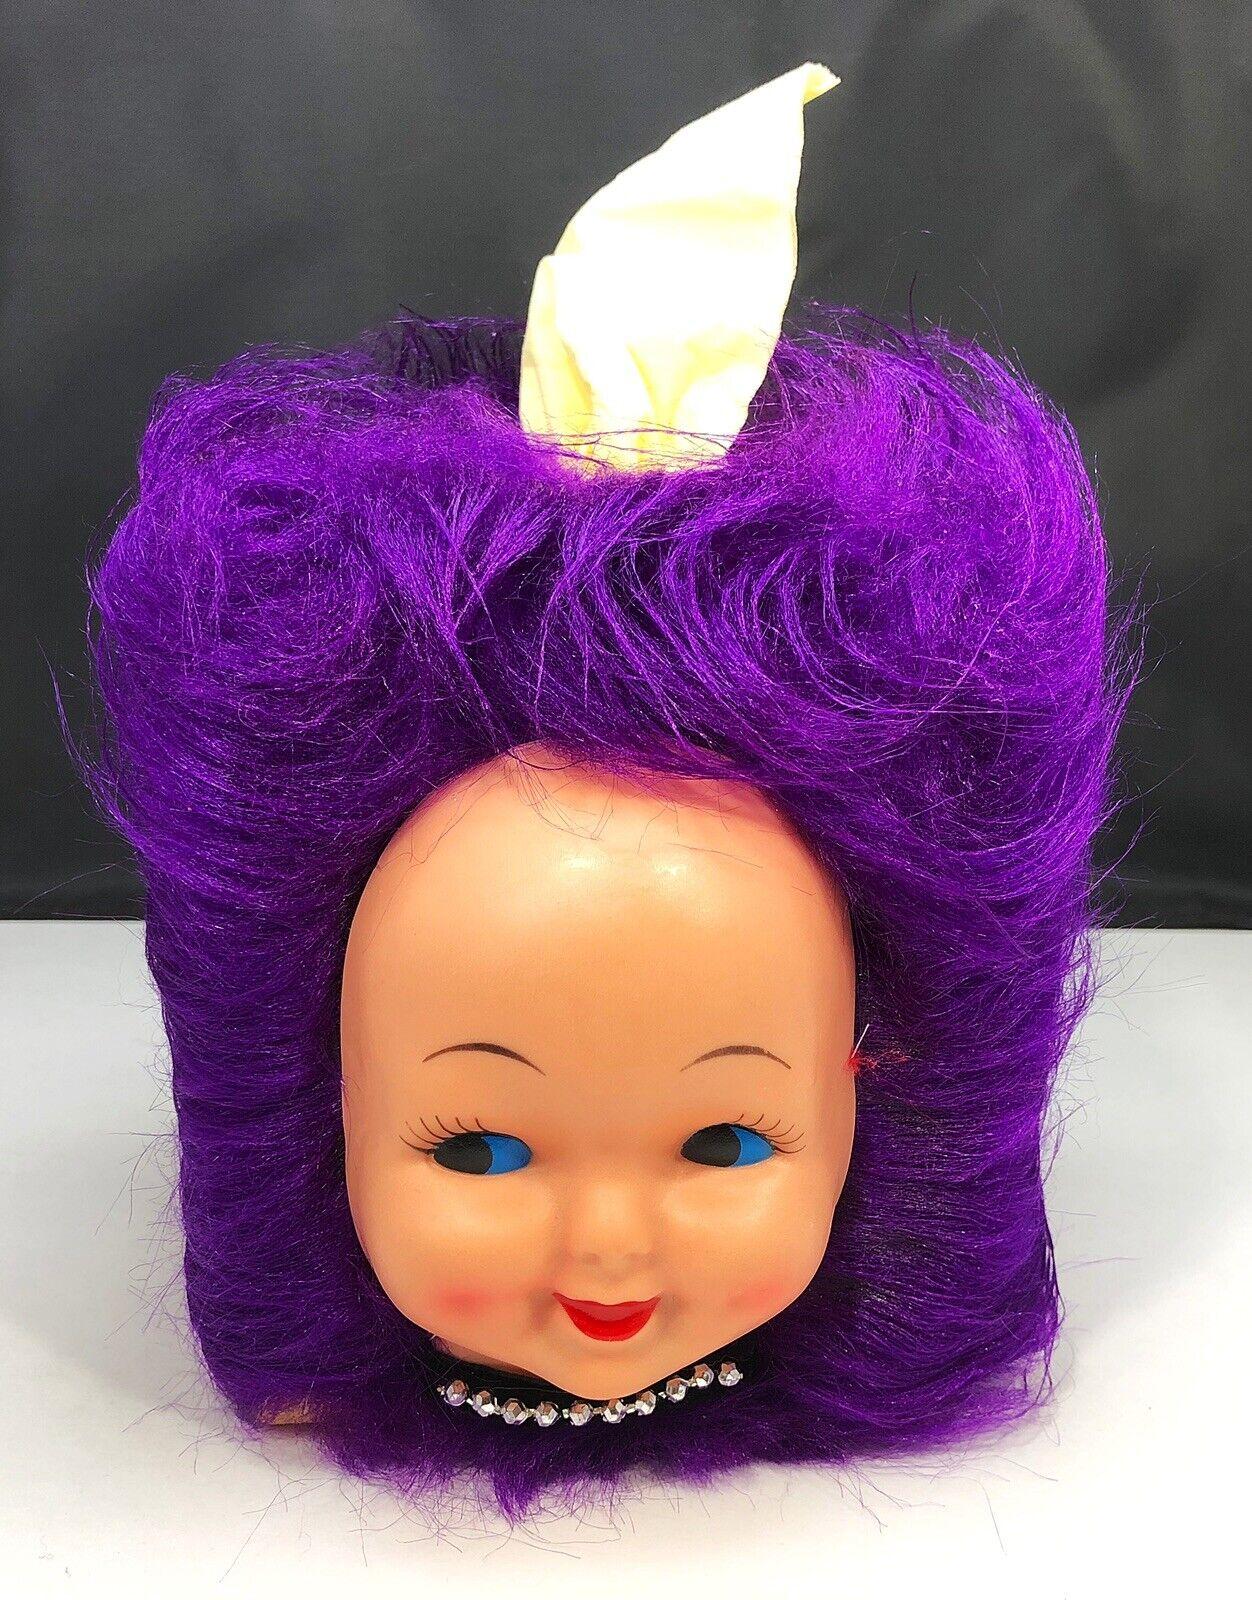 Vintage Doll Head Face Tissue Box Cover Dispenser Purple HAIR w/ Vtg Kleenex Box